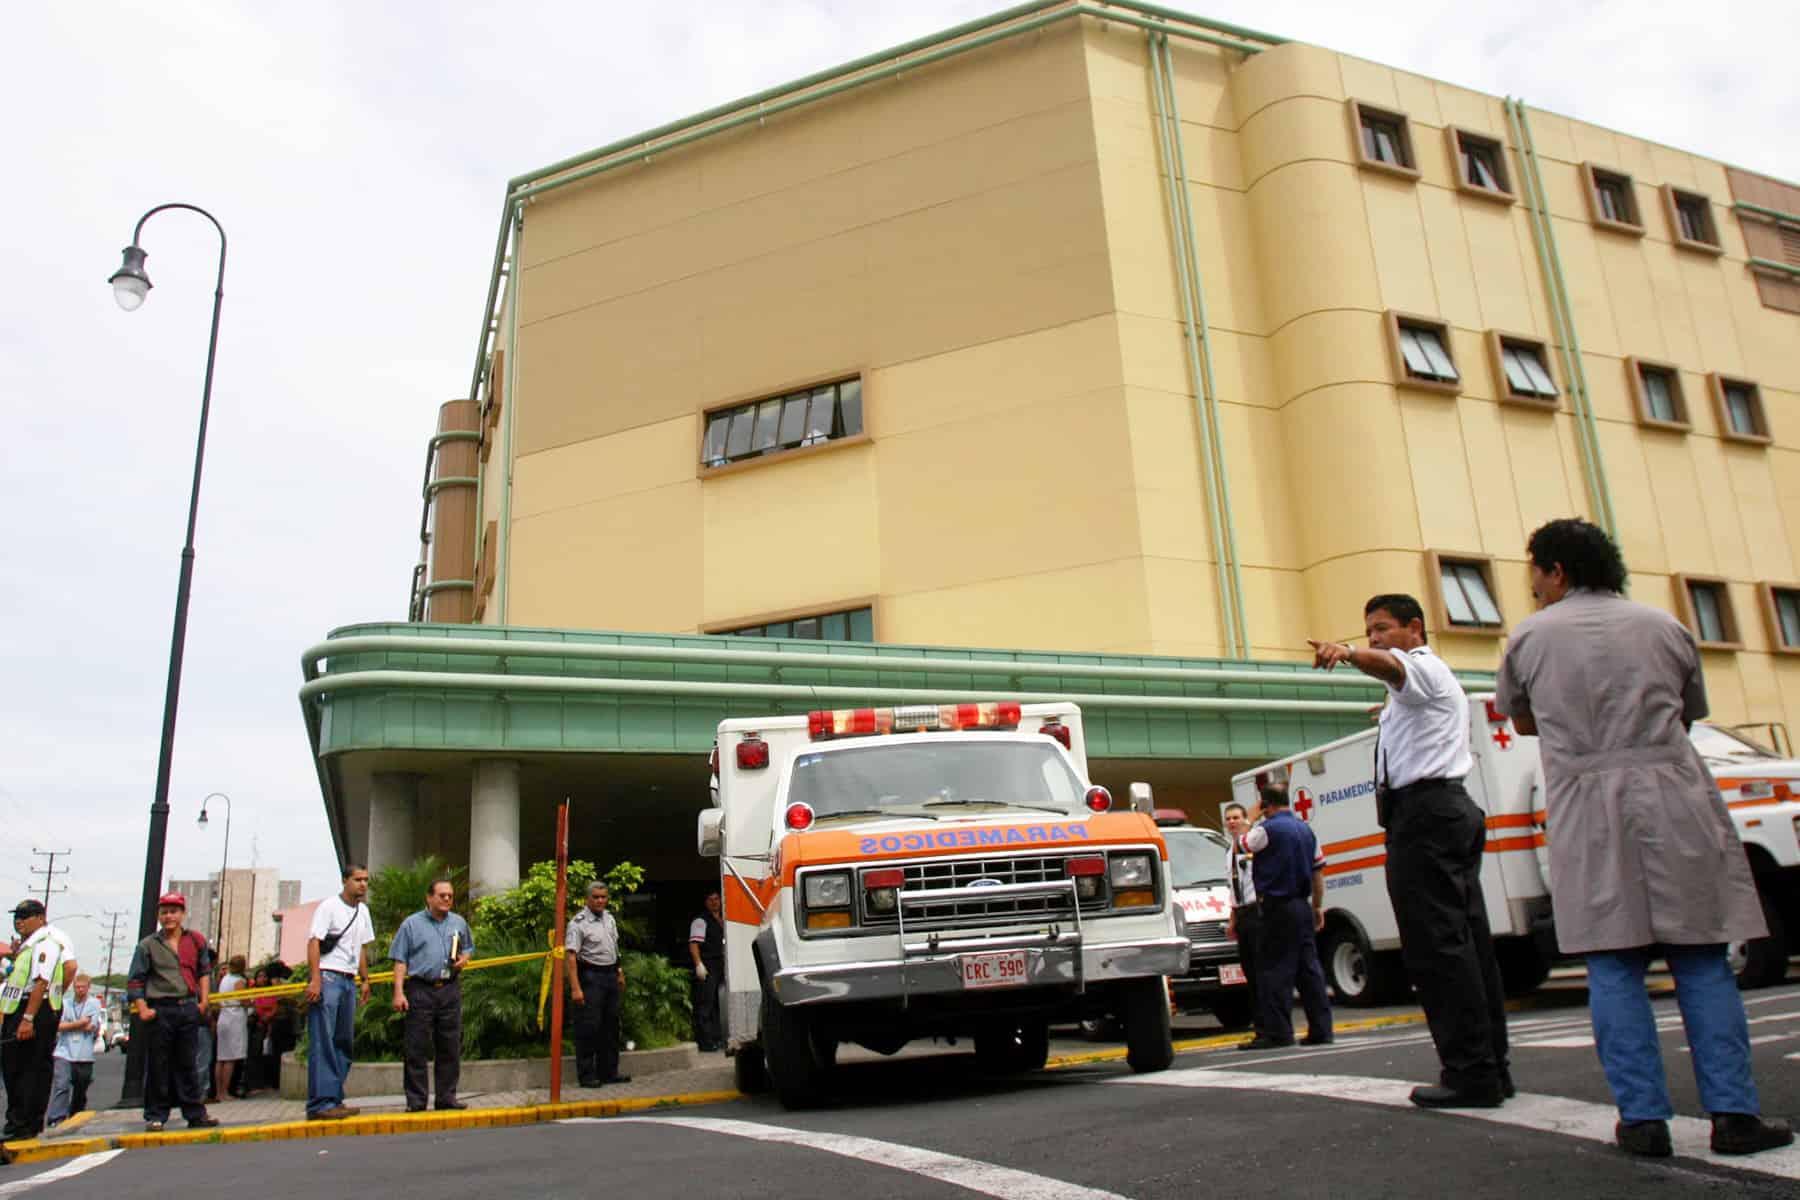 Calderón Guardia Hospital, San José